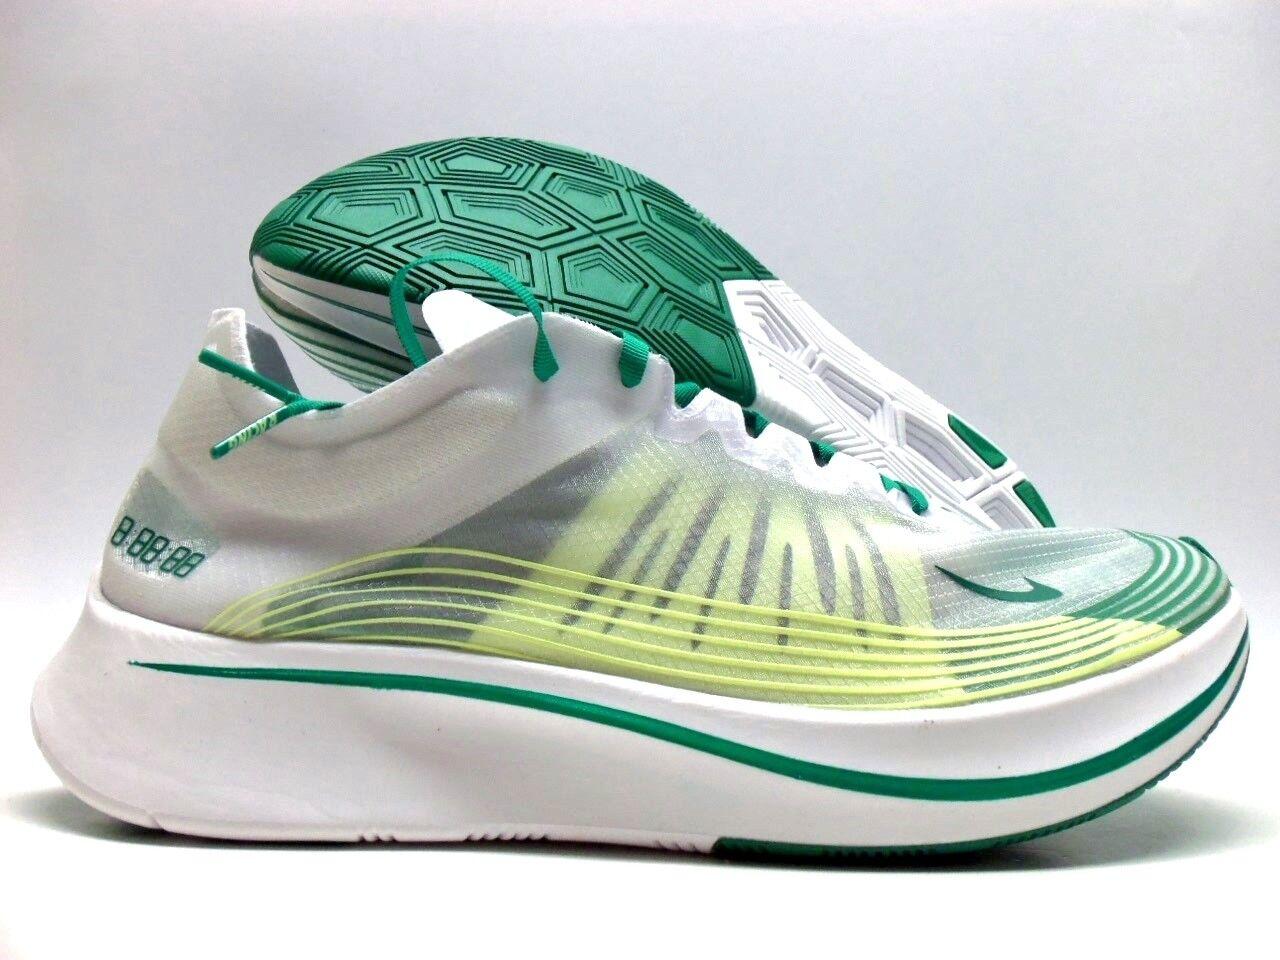 Nike zoom fly sp hong kong bianco / verde lucido dimensioni uomini [aj9282-101]